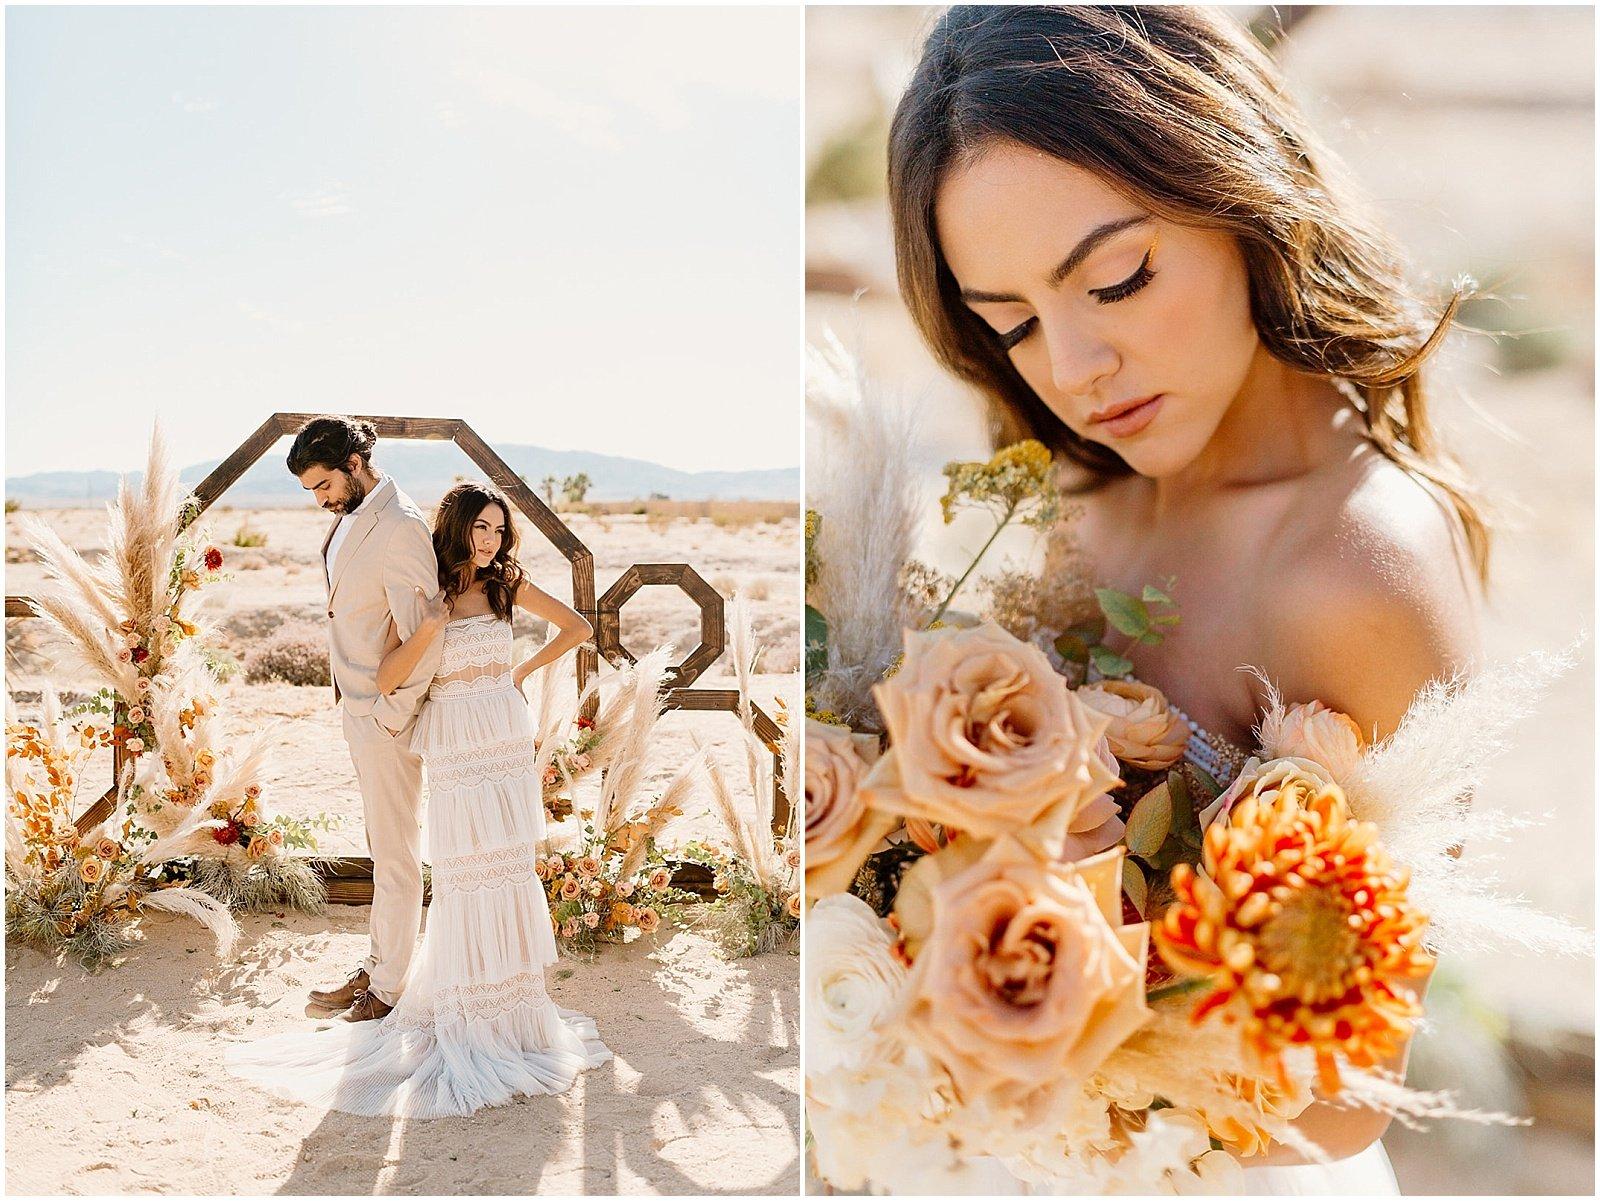 wedding ceremony set up in Joshua Tree, California